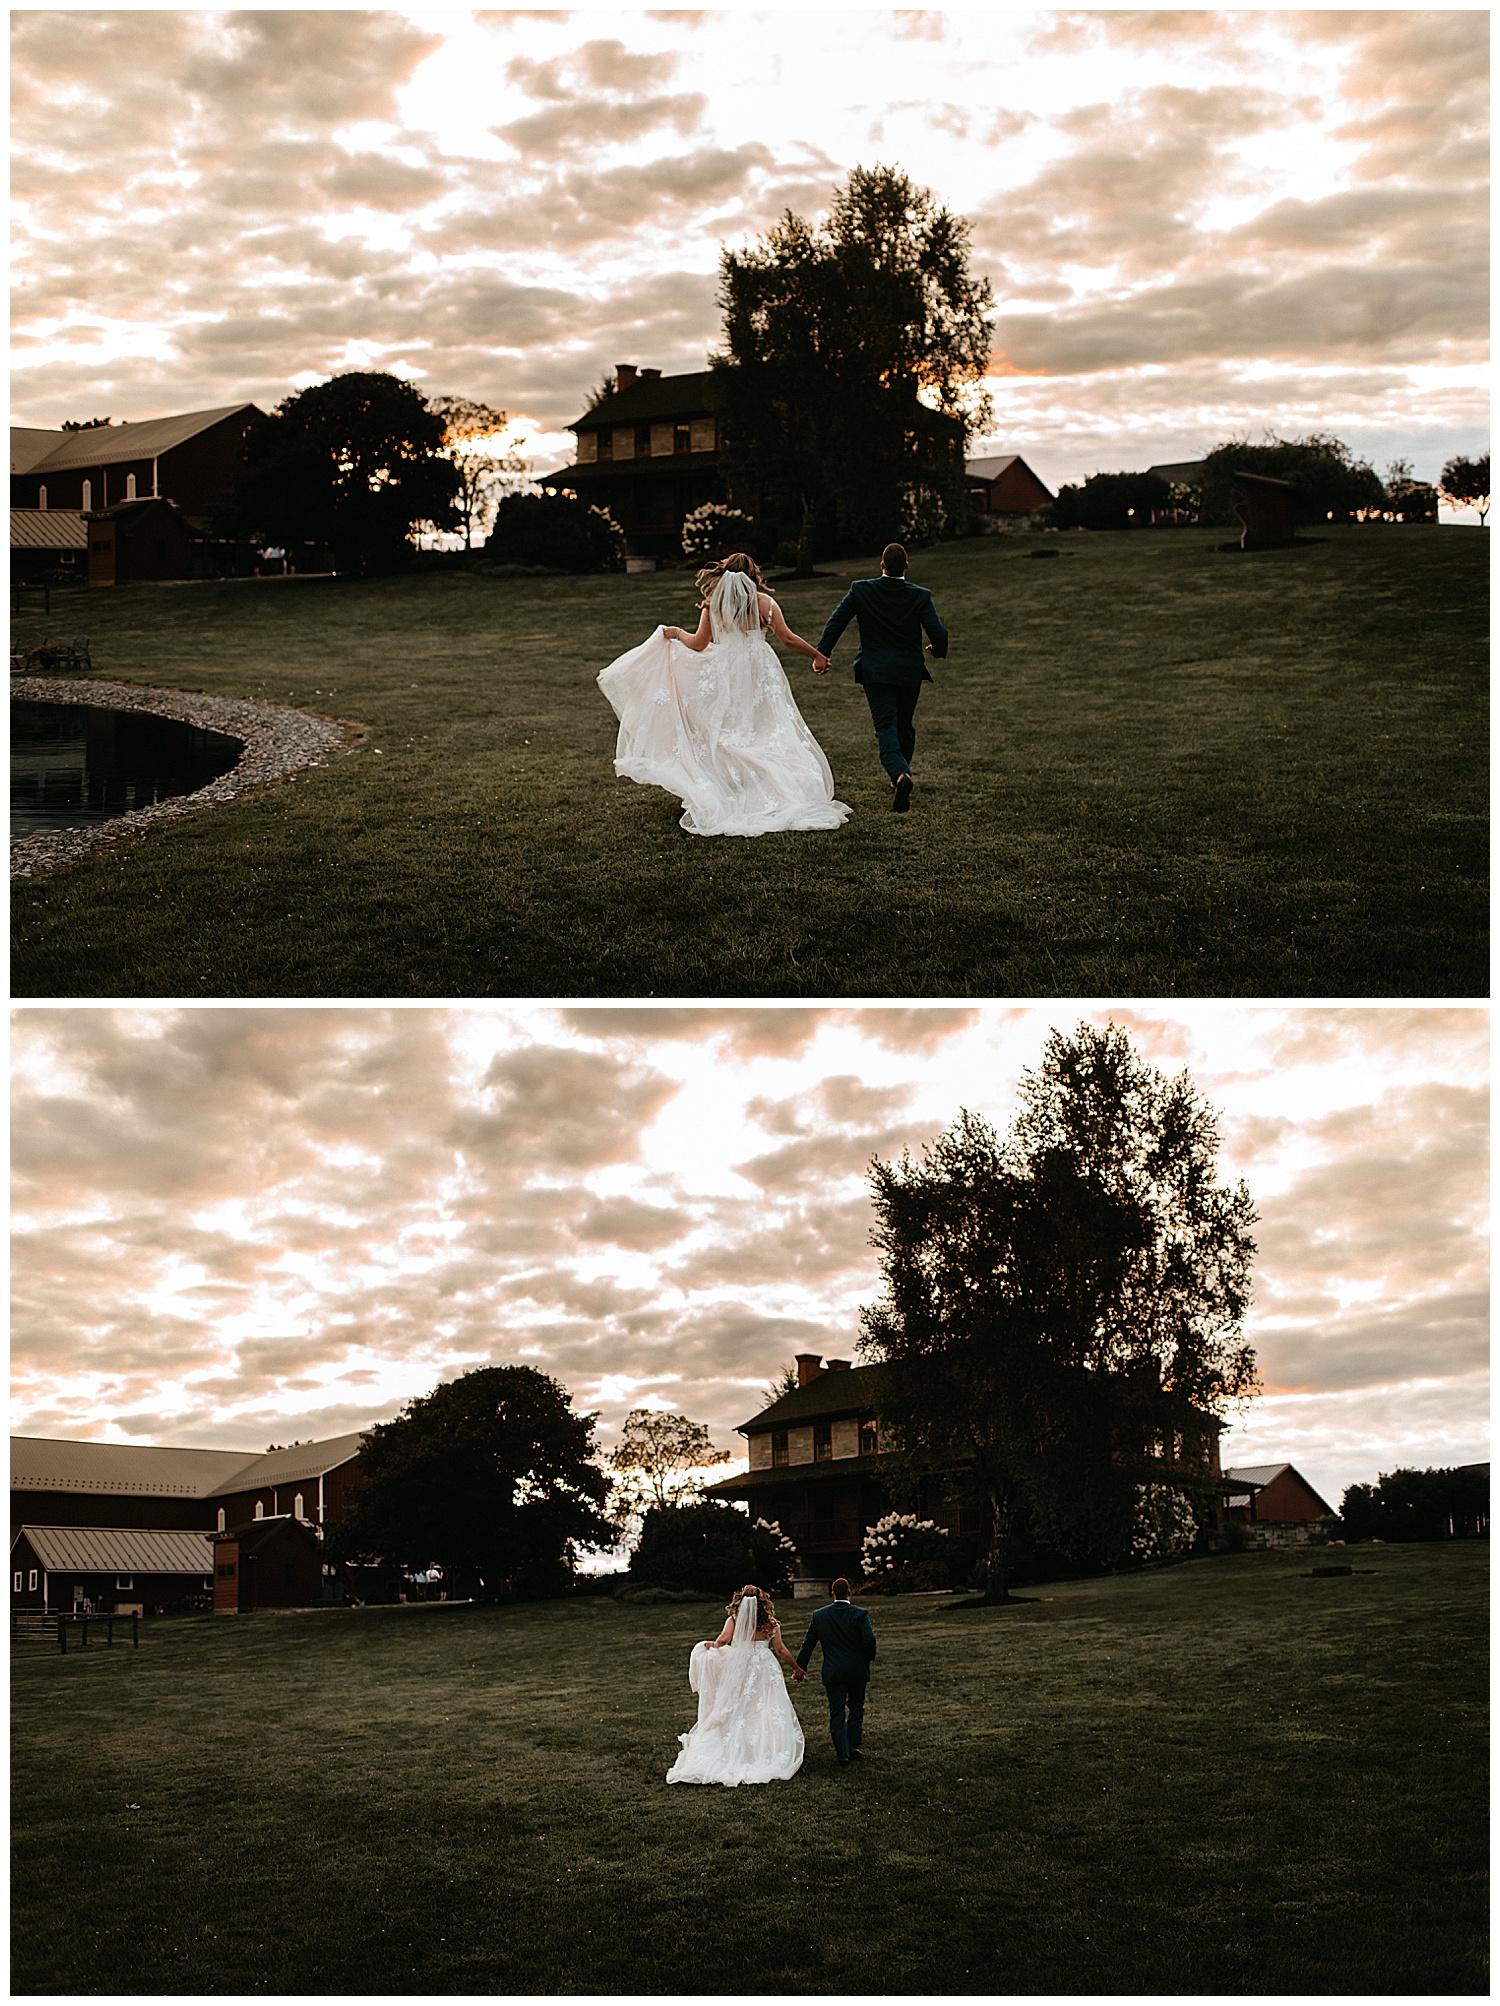 NEPA-Bloomgsburg-Wedding-Photographer-at-The-Barn-at-Greystone-Farms-Watsontown-PA_0103.jpg